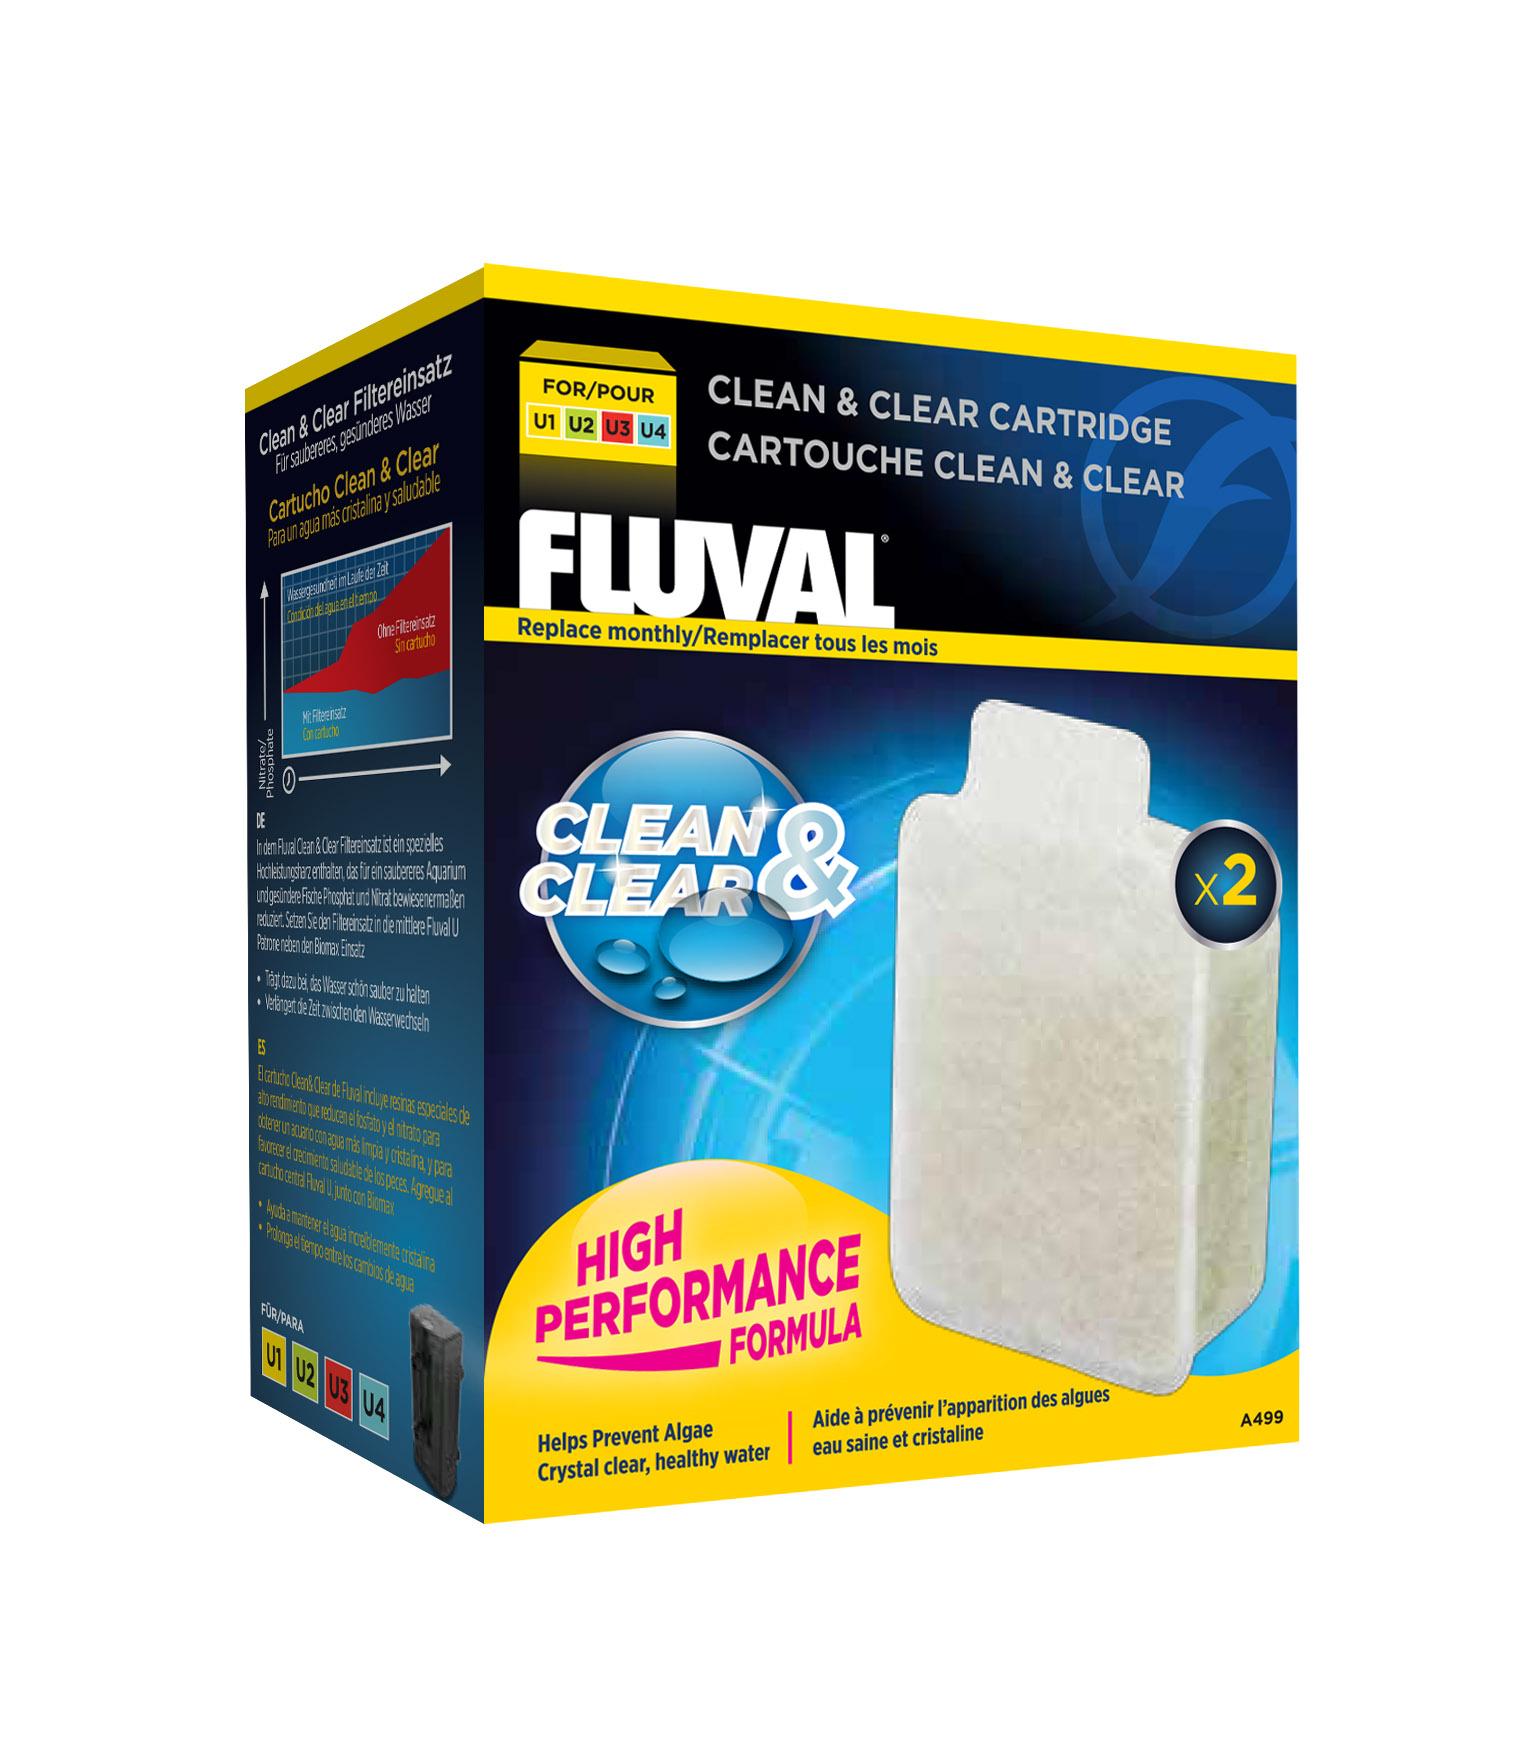 Fluval Clean & Clear Cartridge